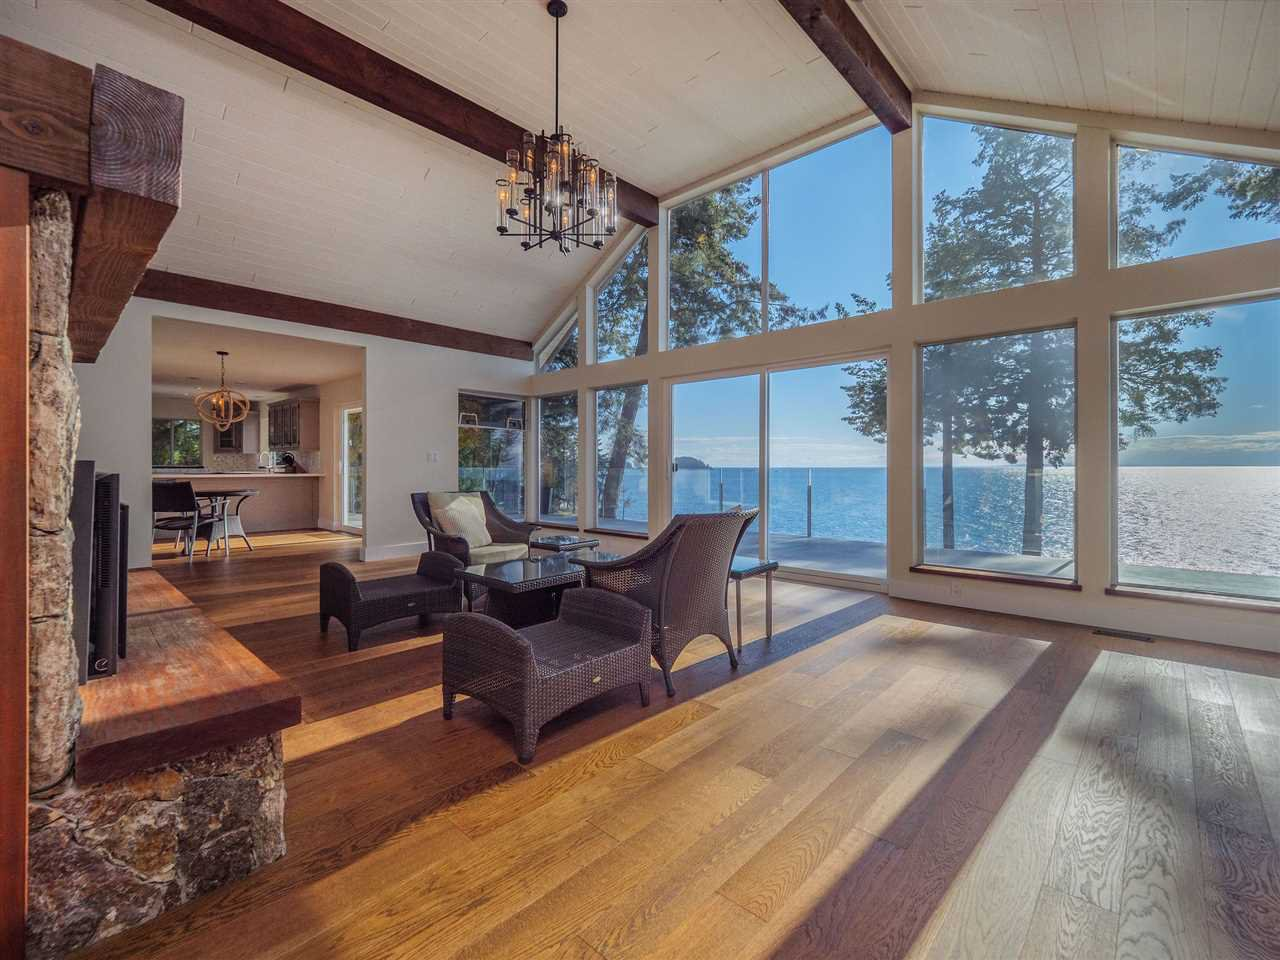 "Photo 19: Photos: 7101 DALE Road in Sechelt: Sechelt District House for sale in ""Caleda Estates"" (Sunshine Coast)  : MLS®# R2515160"